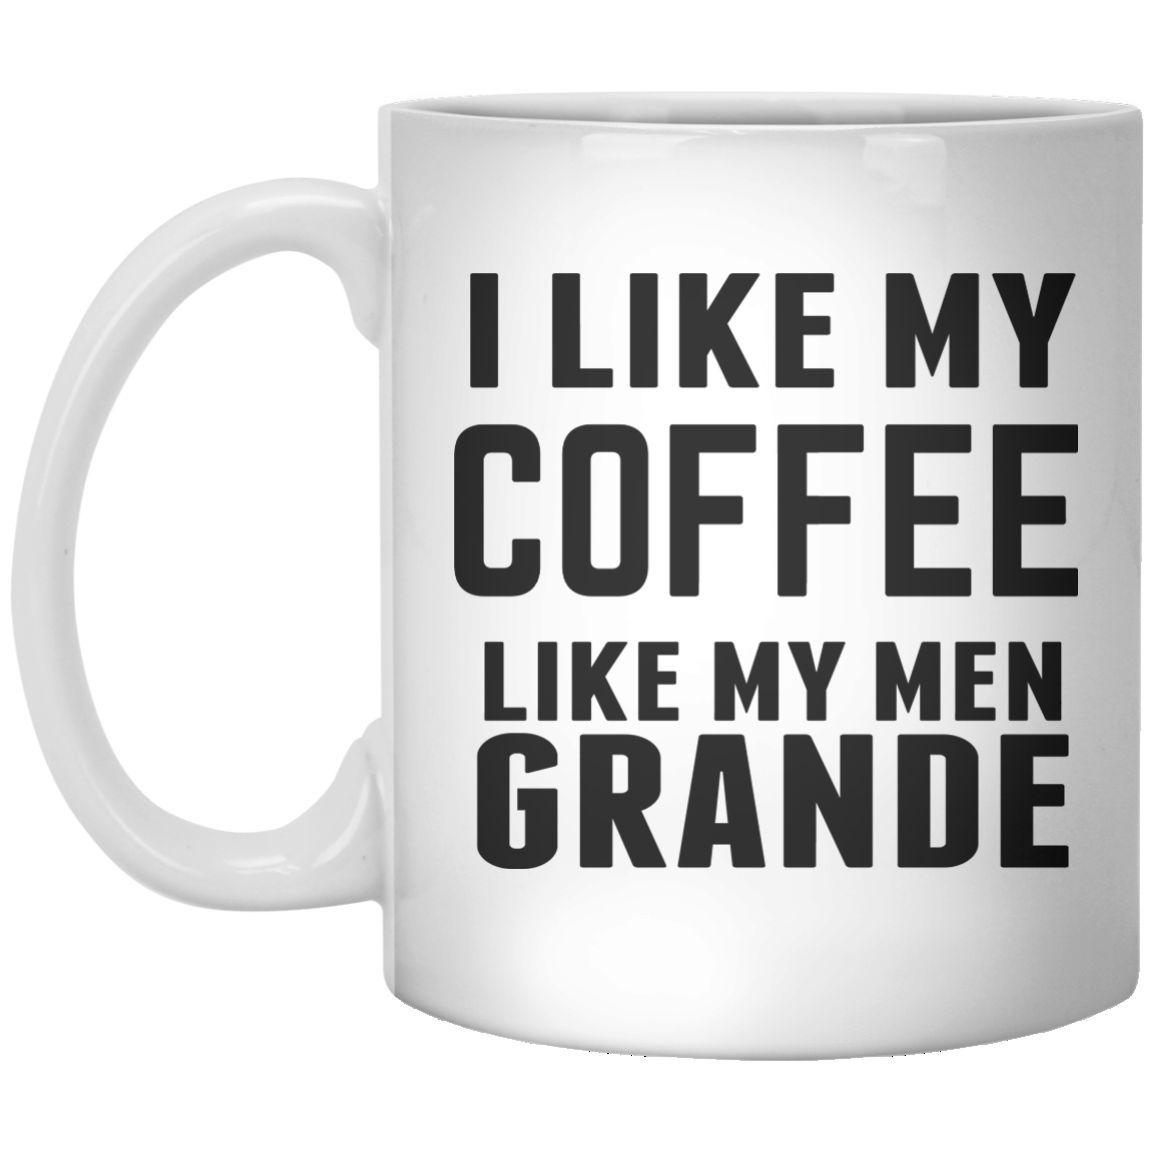 i like my coffee like my men grande MUG | Mugs, My coffee ...